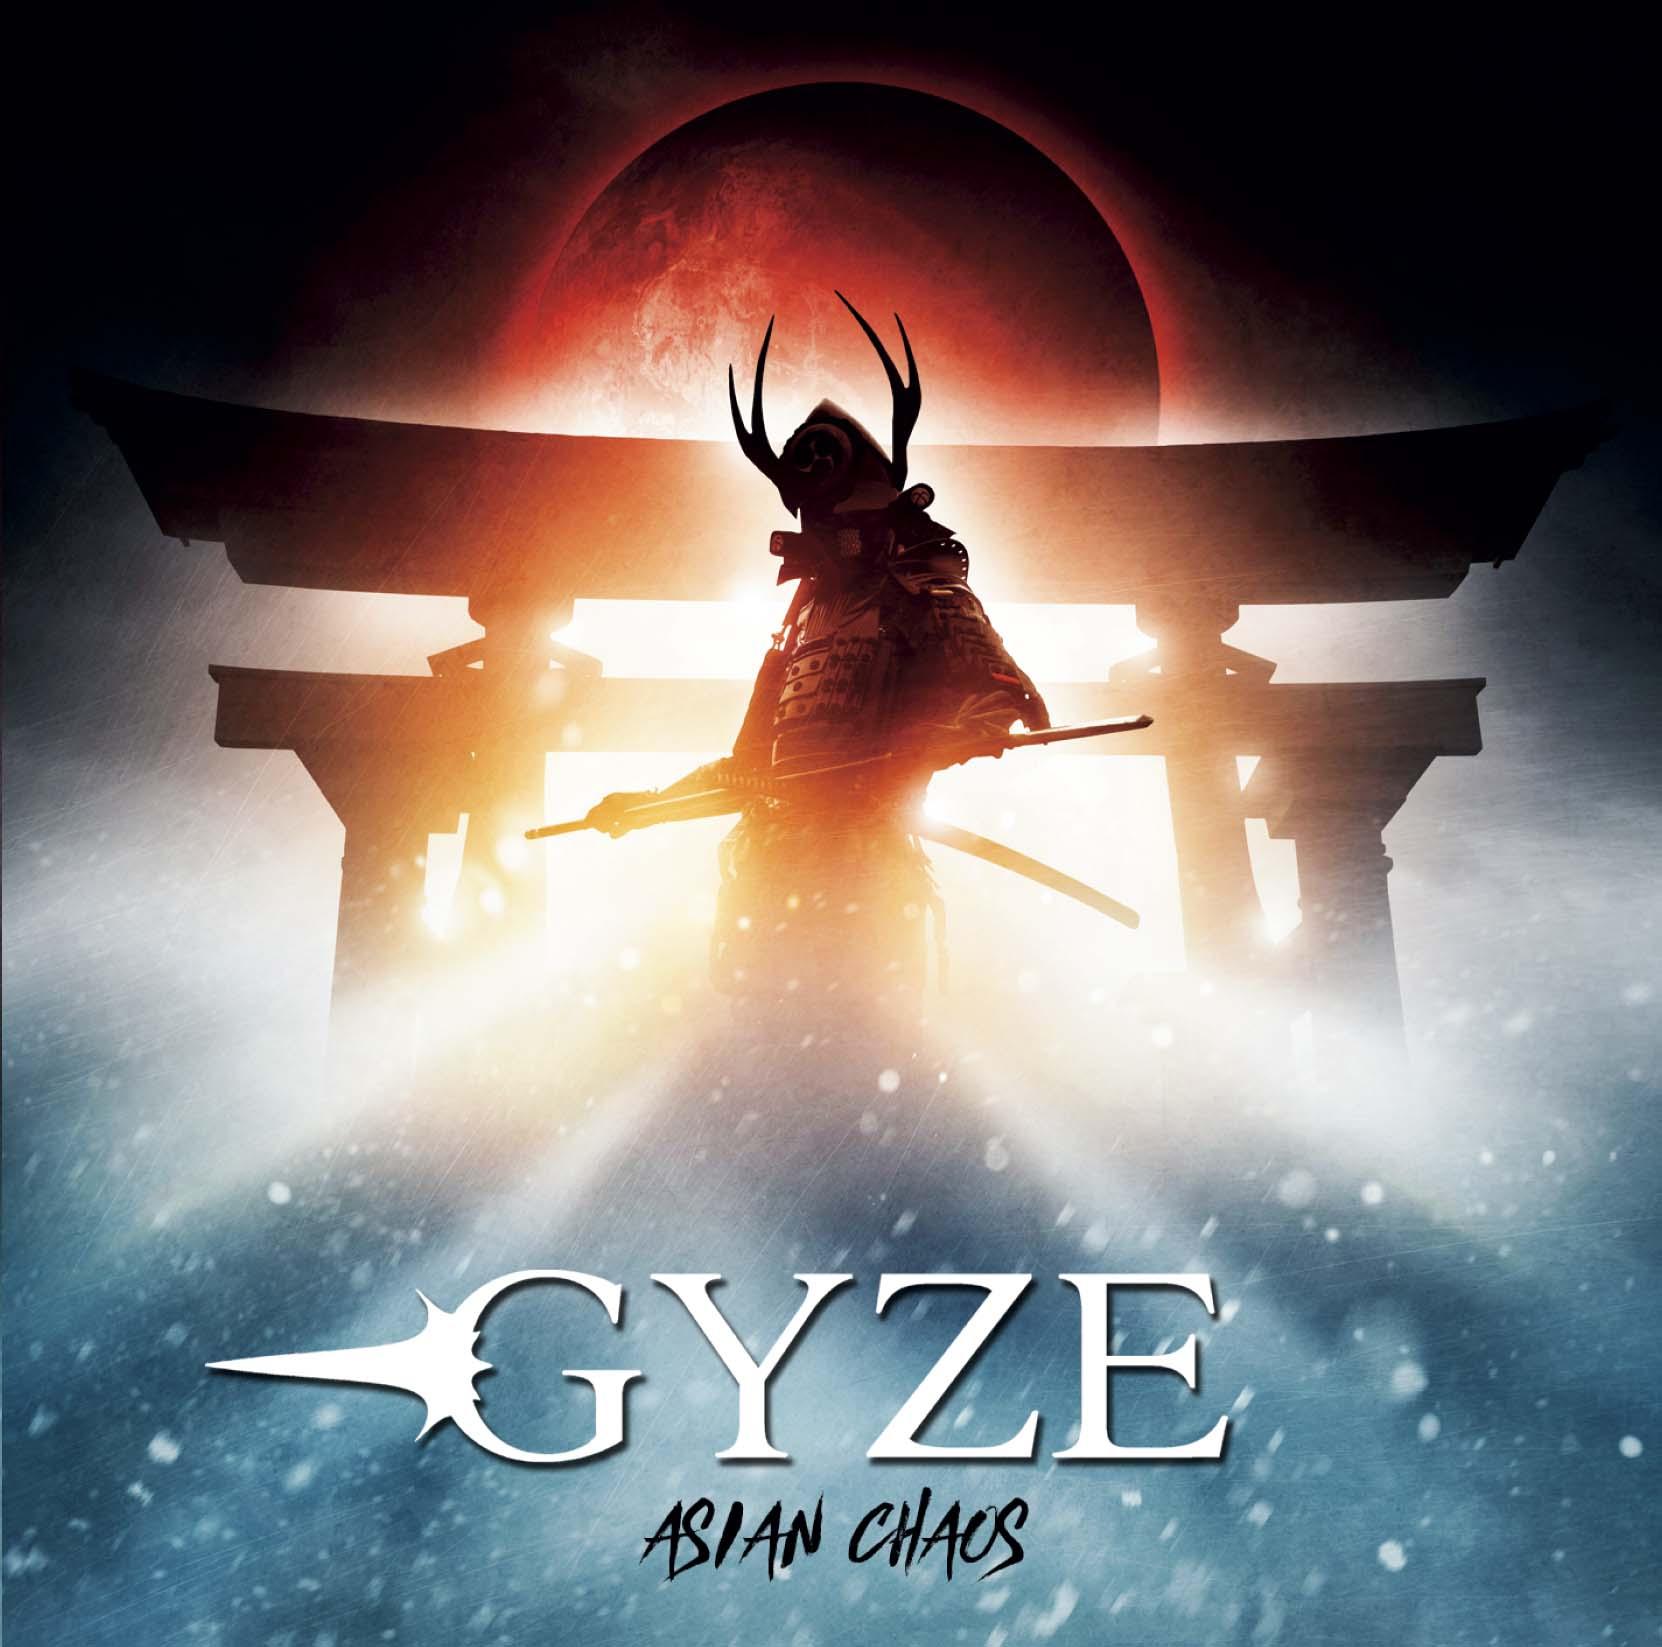 gyze-asian-chaos-die-sonne-geht-auf-album-review